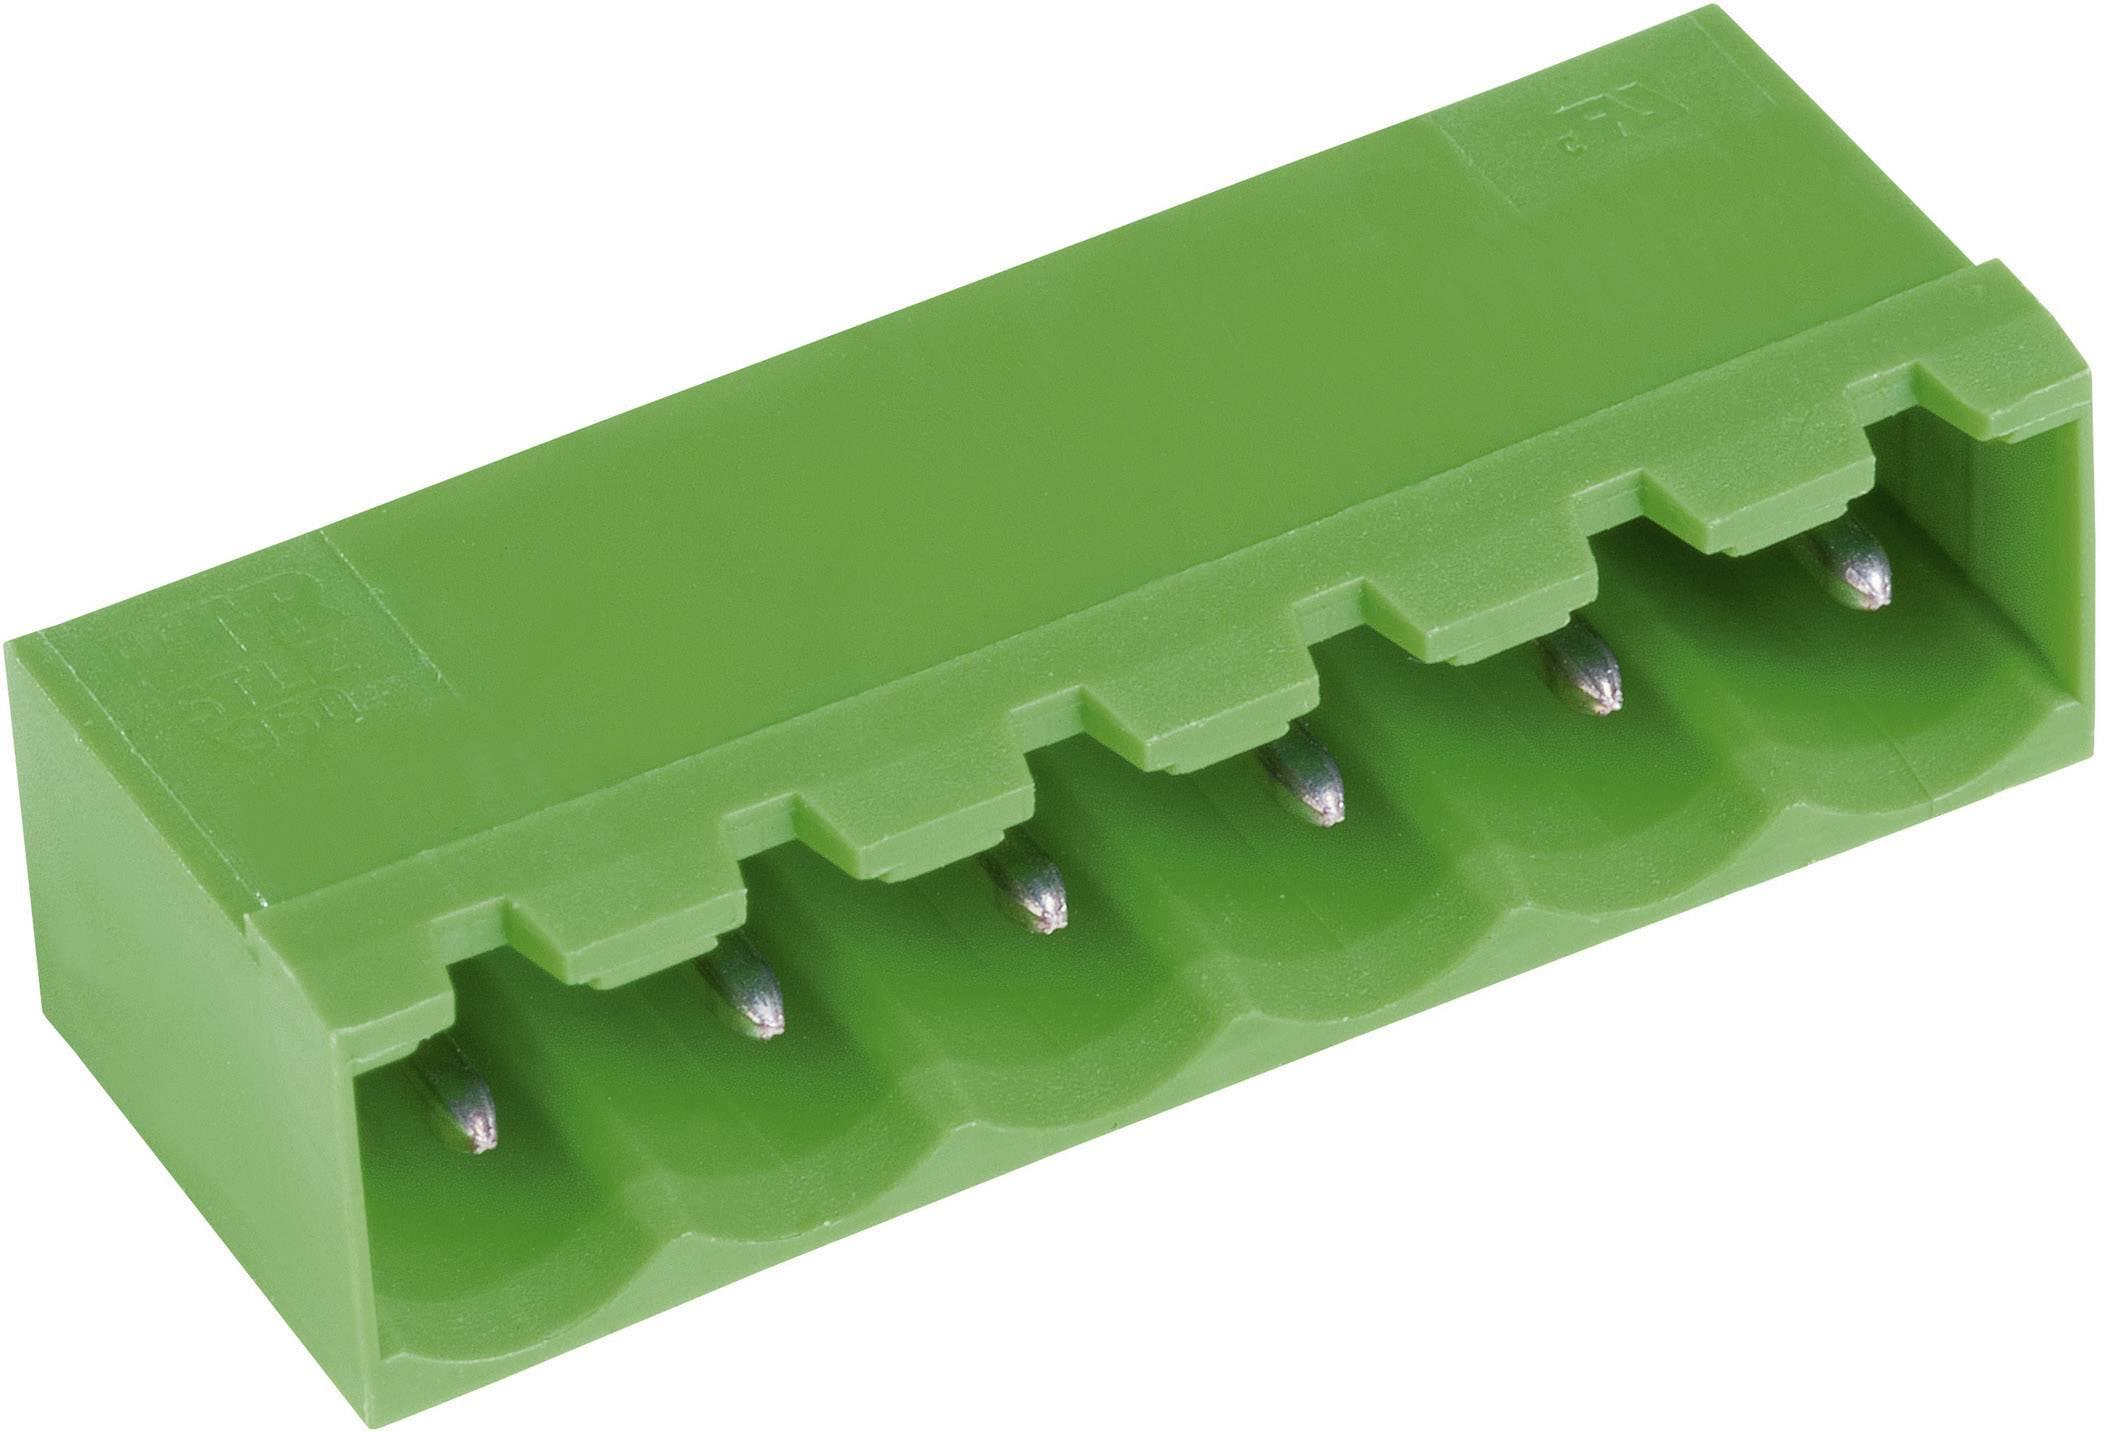 Konektor do DPS PTR STLZ950/3G-5.08-H 50950035021F, 16.44 mm, pólů 3, rozteč 5.08 mm, 1 ks